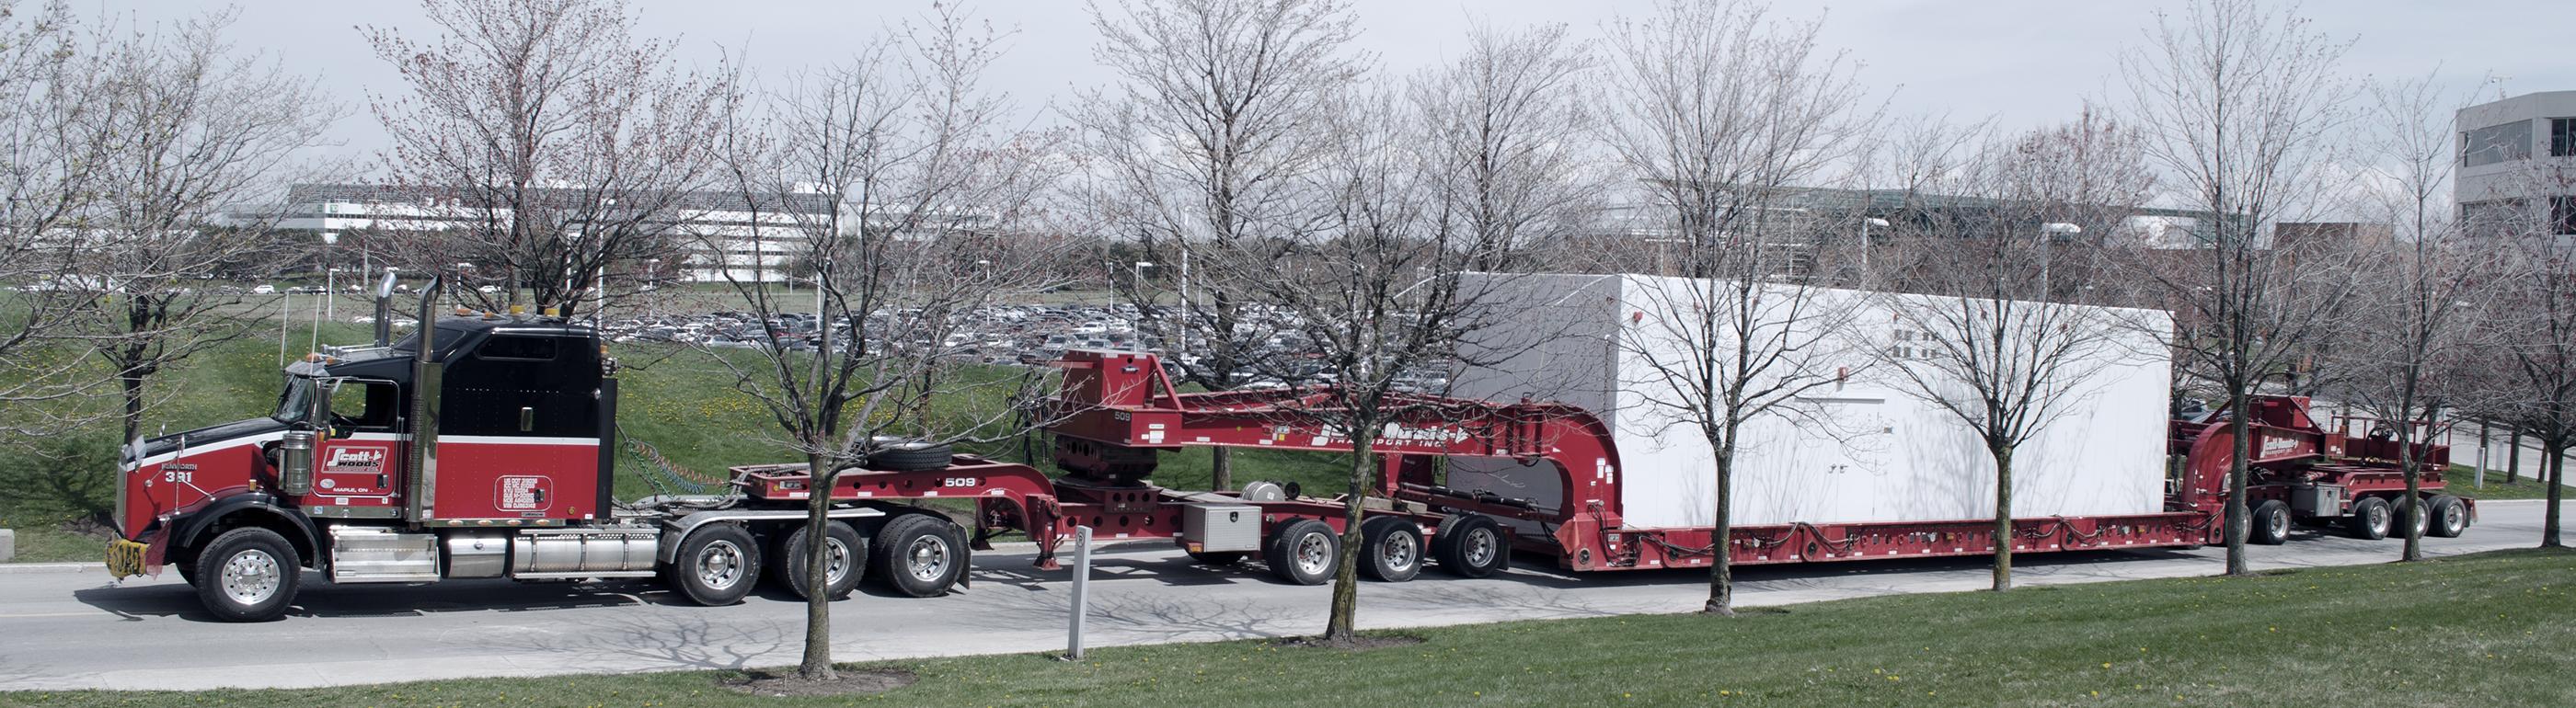 Heavy haul truck transporting oversized equipment